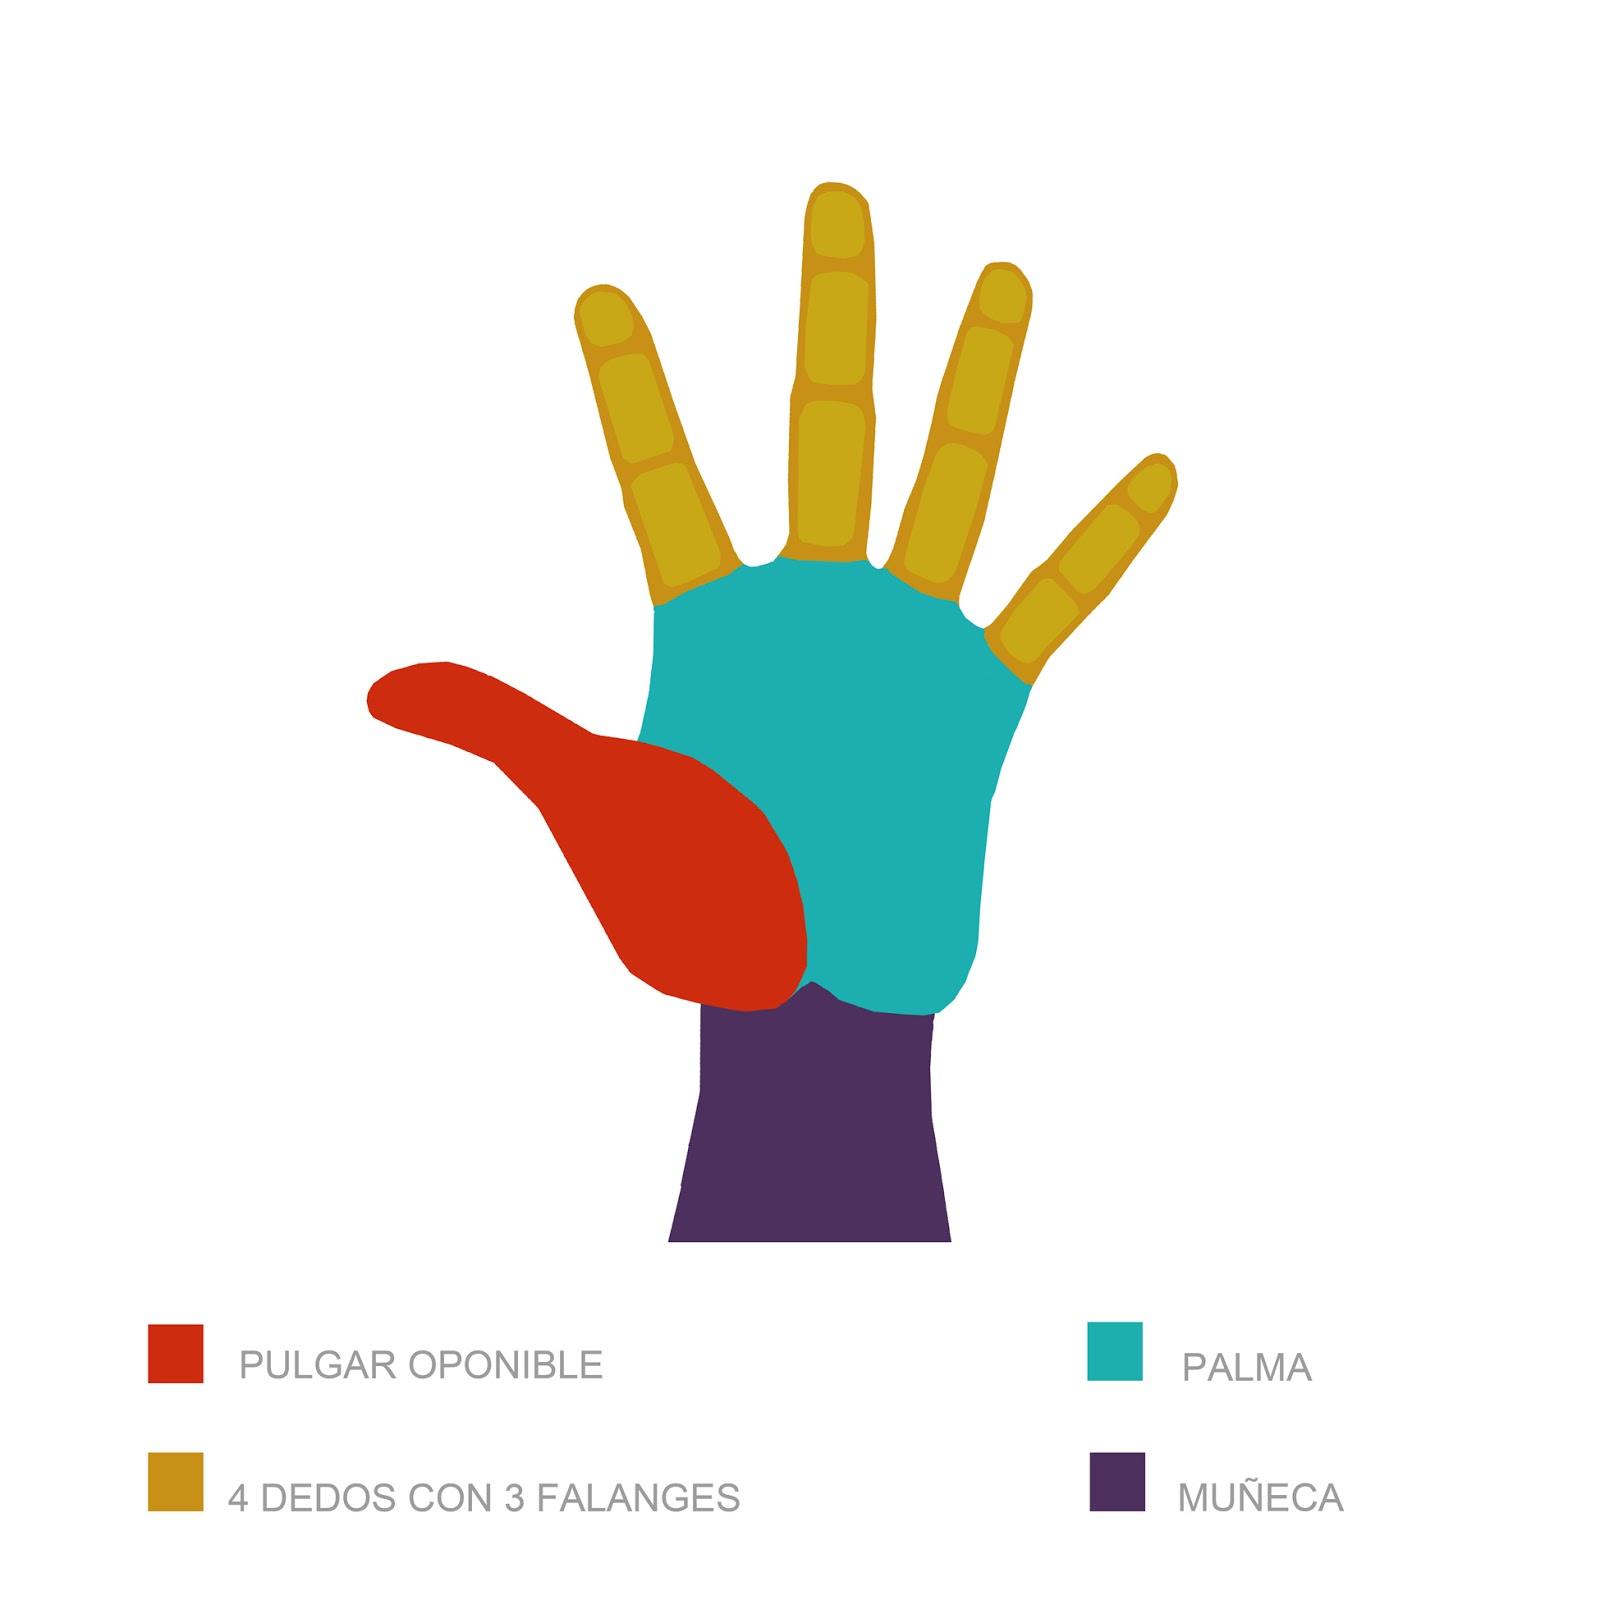 pulgar, cuatro dedos, palma, muñeca, infografia